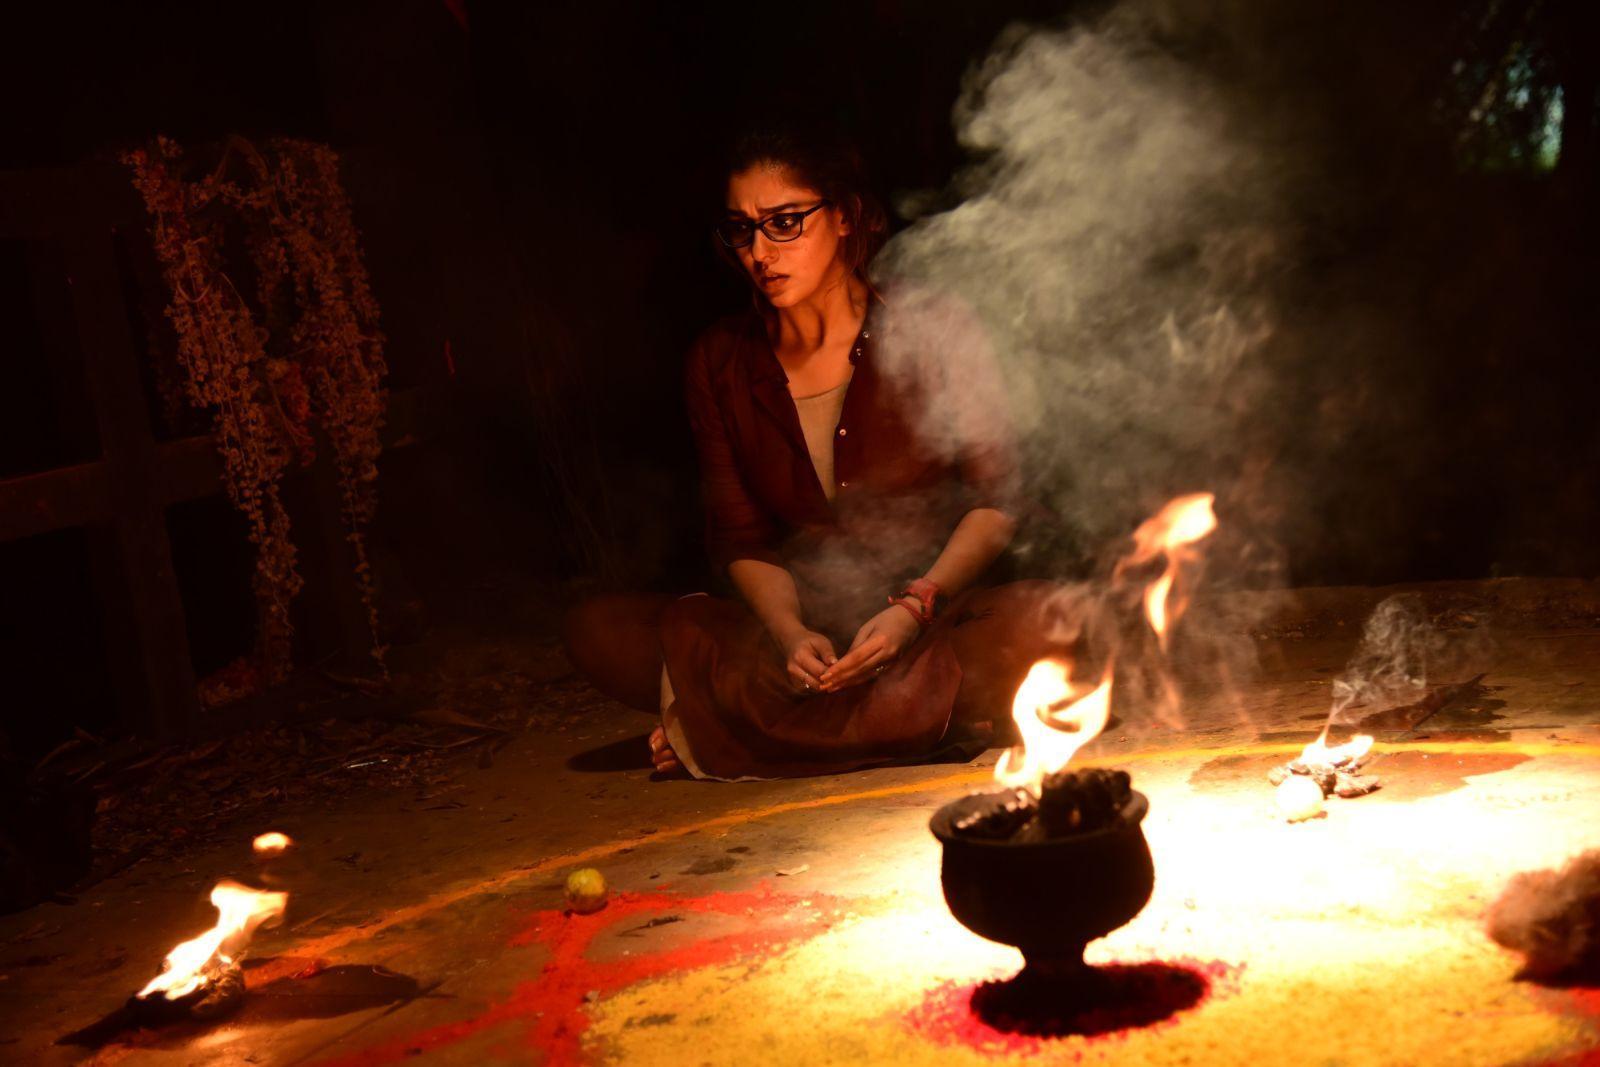 Daas tamil movie hd / Spanish films online with english subtitles